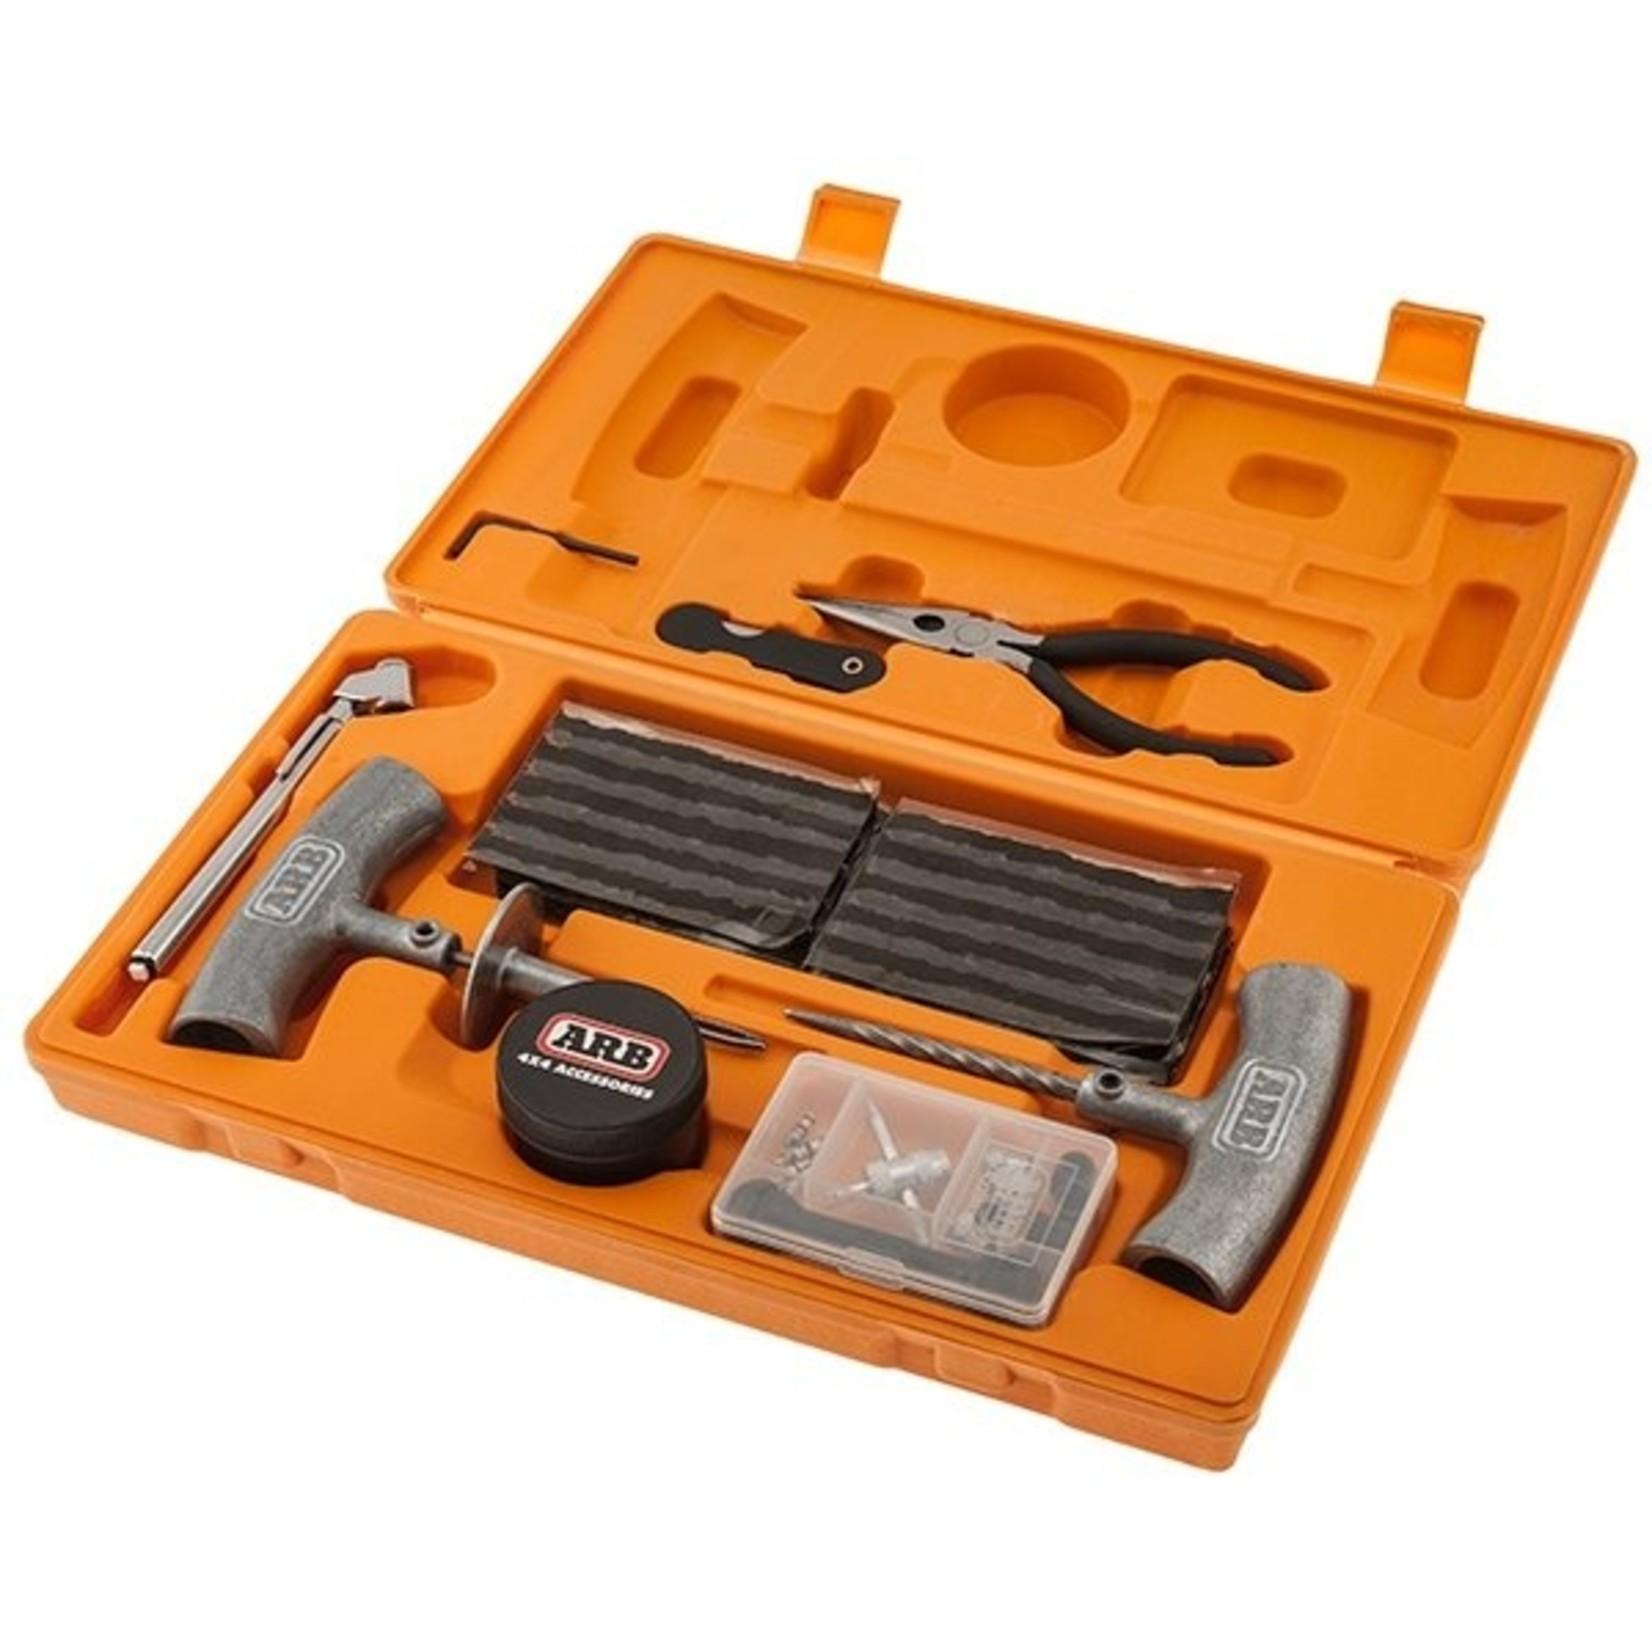 ARB ARB Speedy Seal Repair Kit